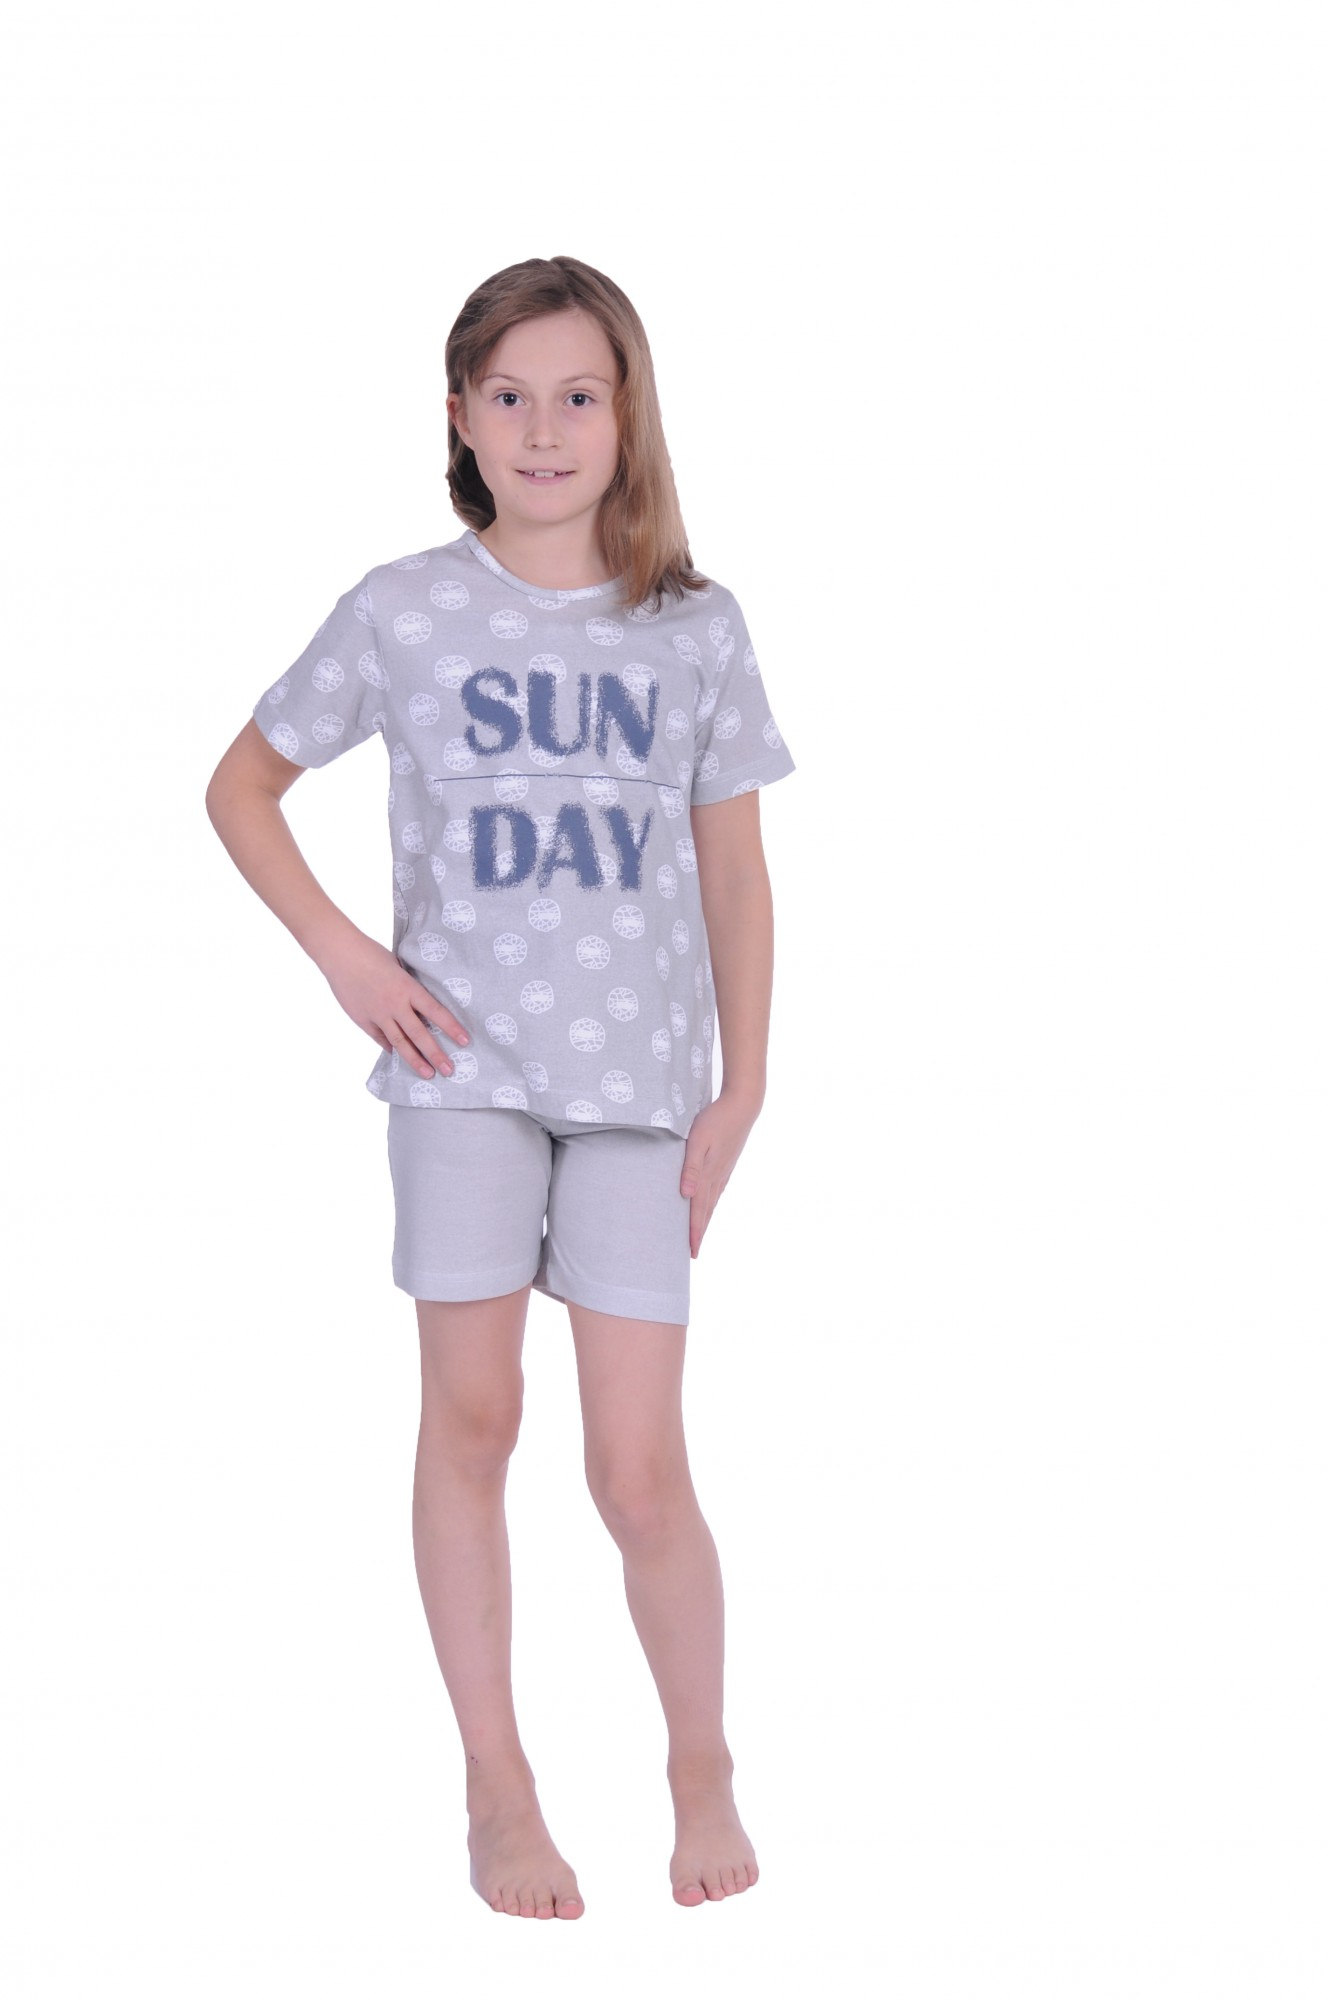 b247221569 Mädchen Kinder Shorty Pyjama kurzarm Schlafanzug mit kurzer Hose 171 405 90  879